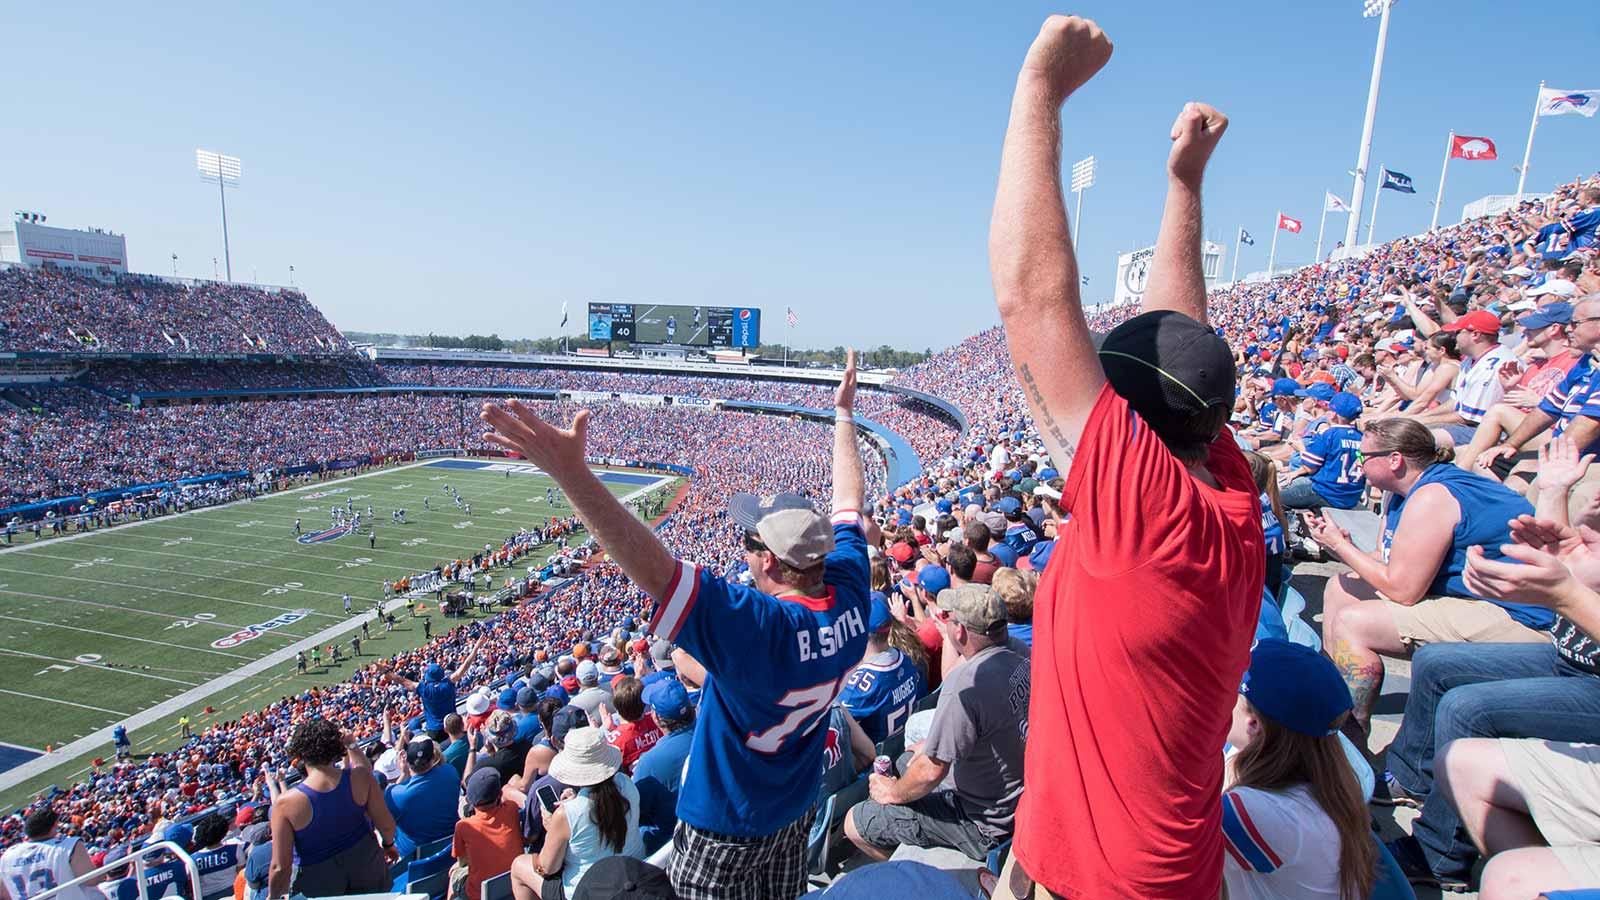 Buffalo Bills fans at New Era Field